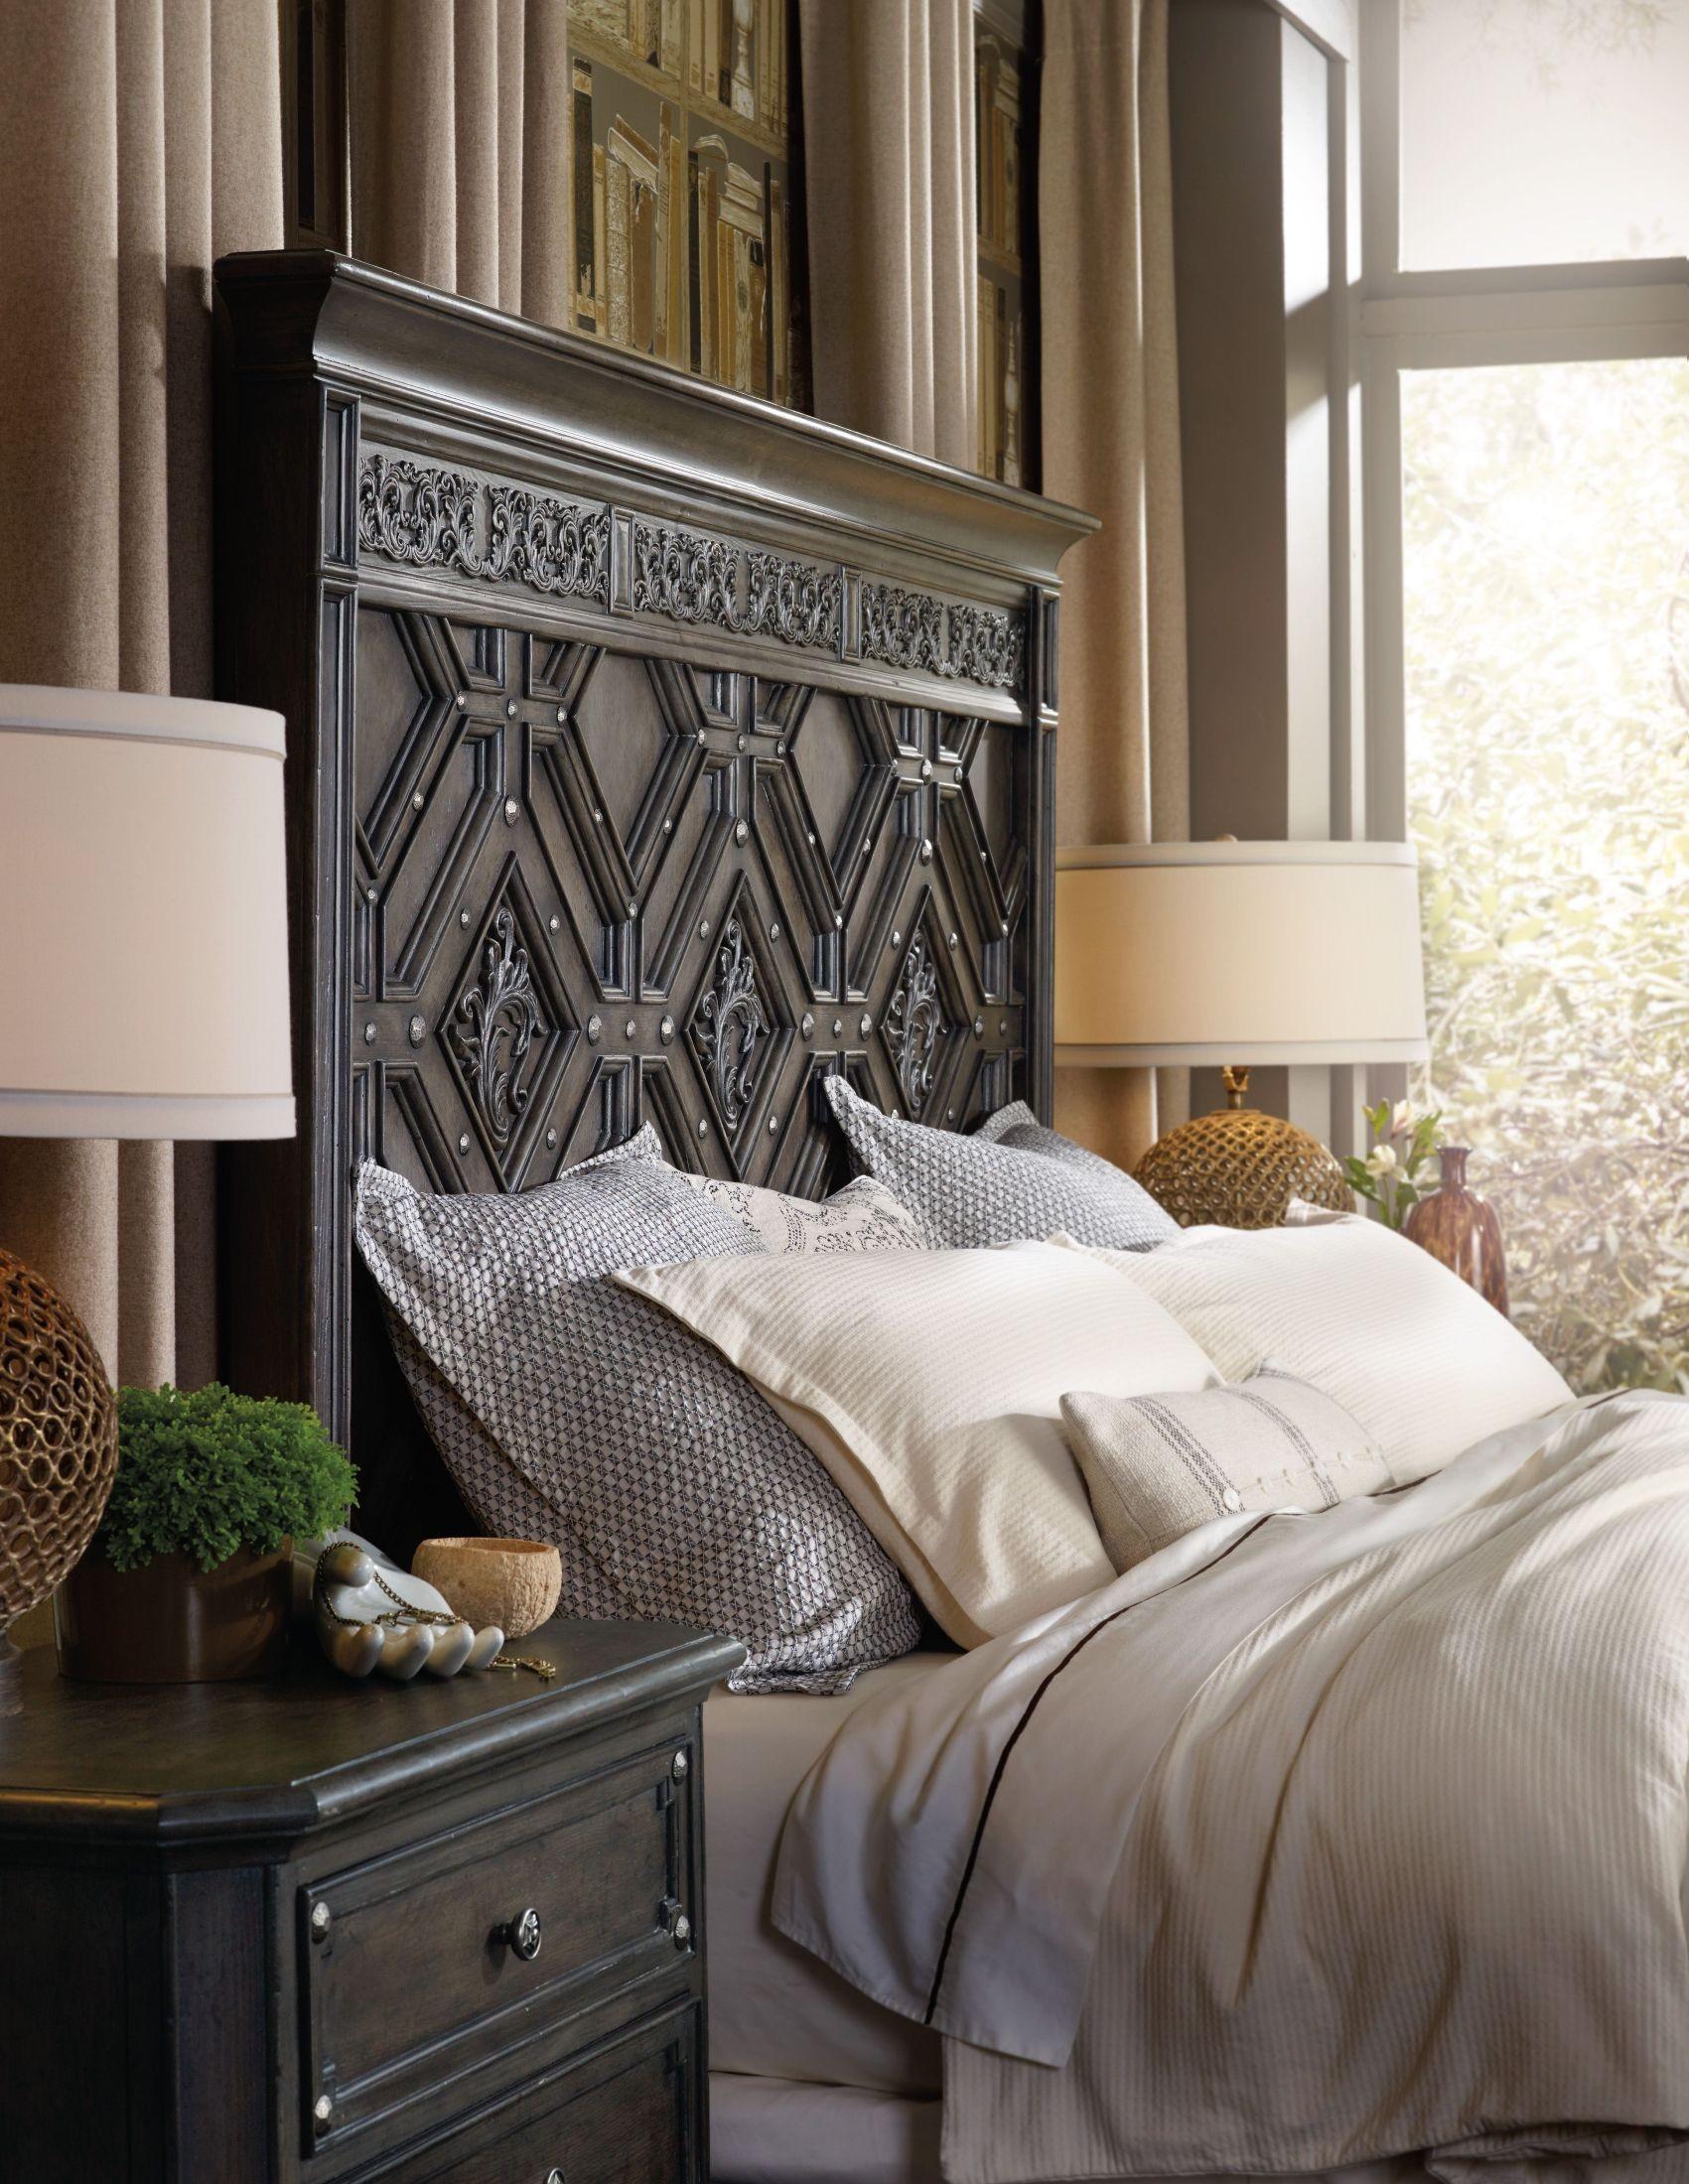 Vintage West Charcoal Gray Wood Panel Bedroom Set, 5700